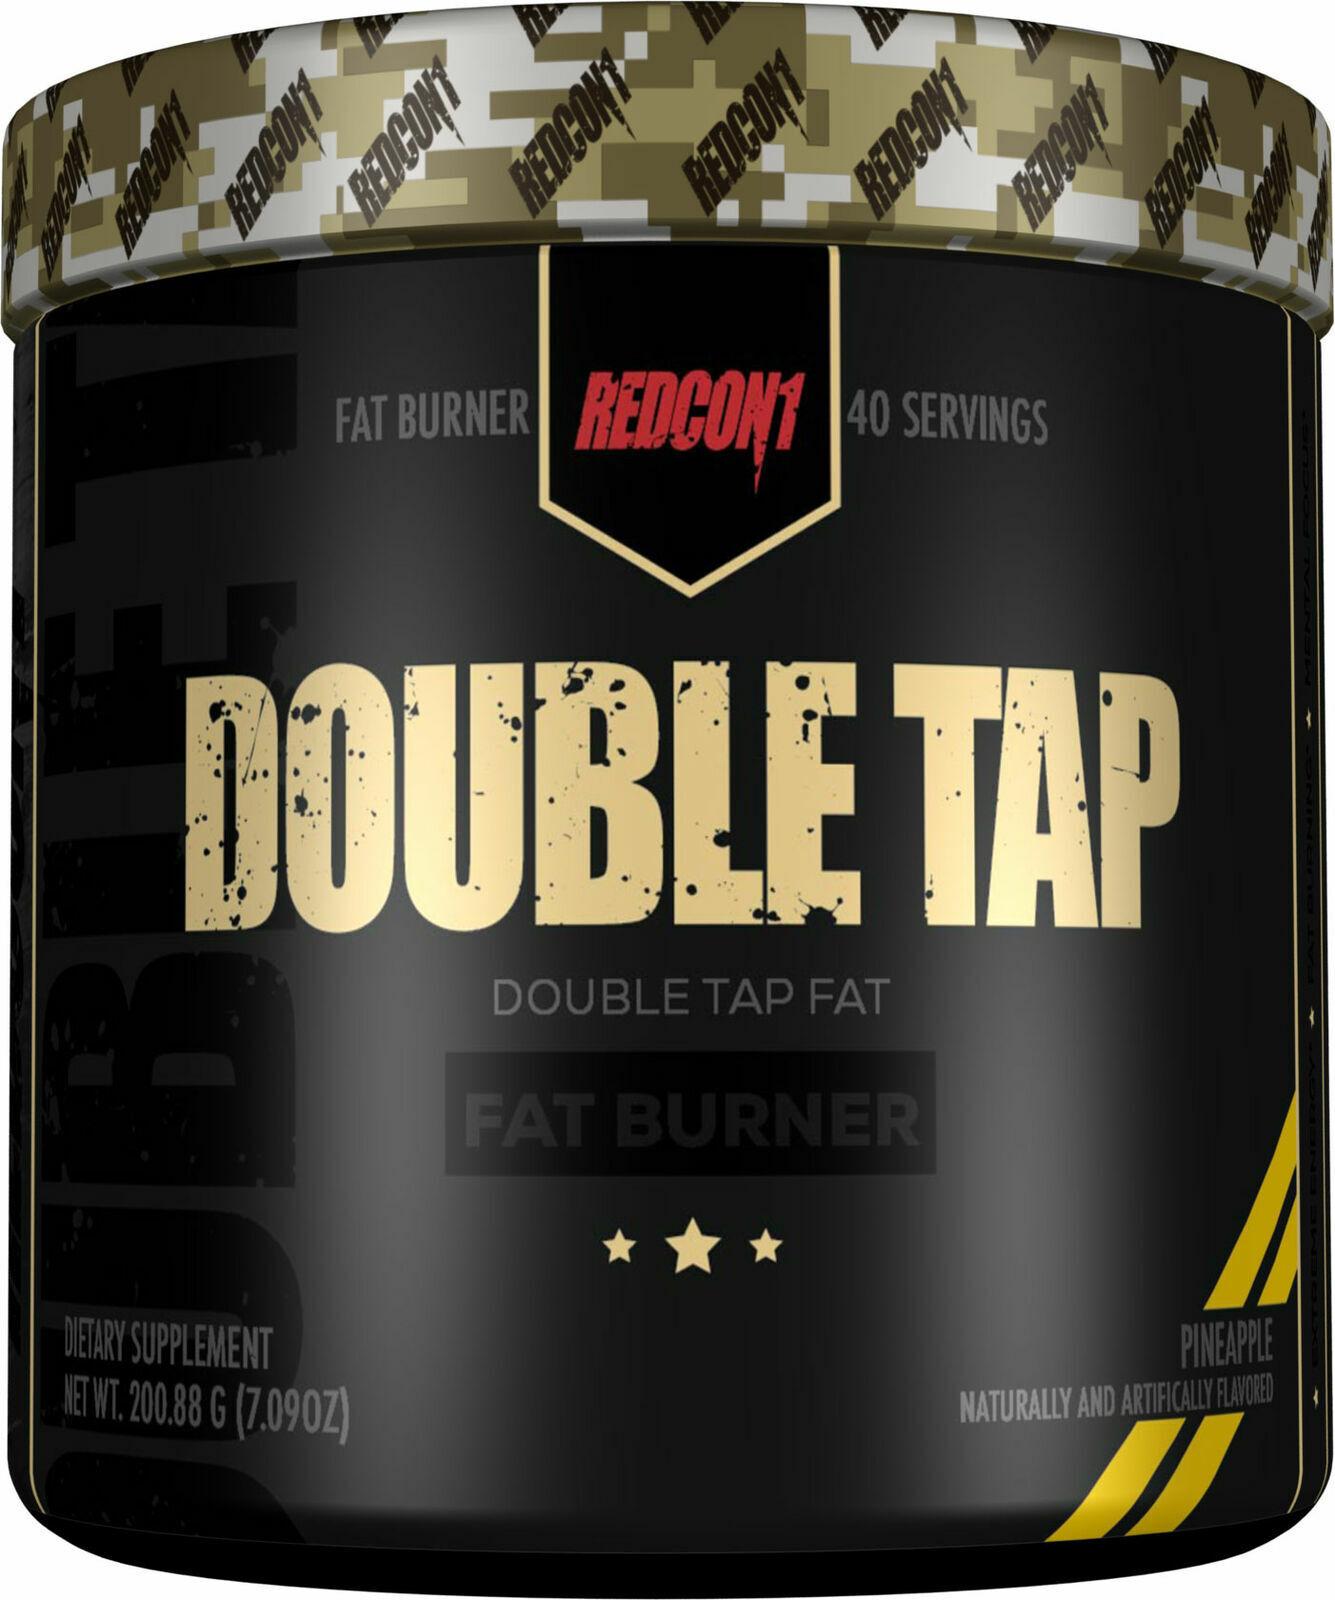 double tap fat burner powder 40 servings